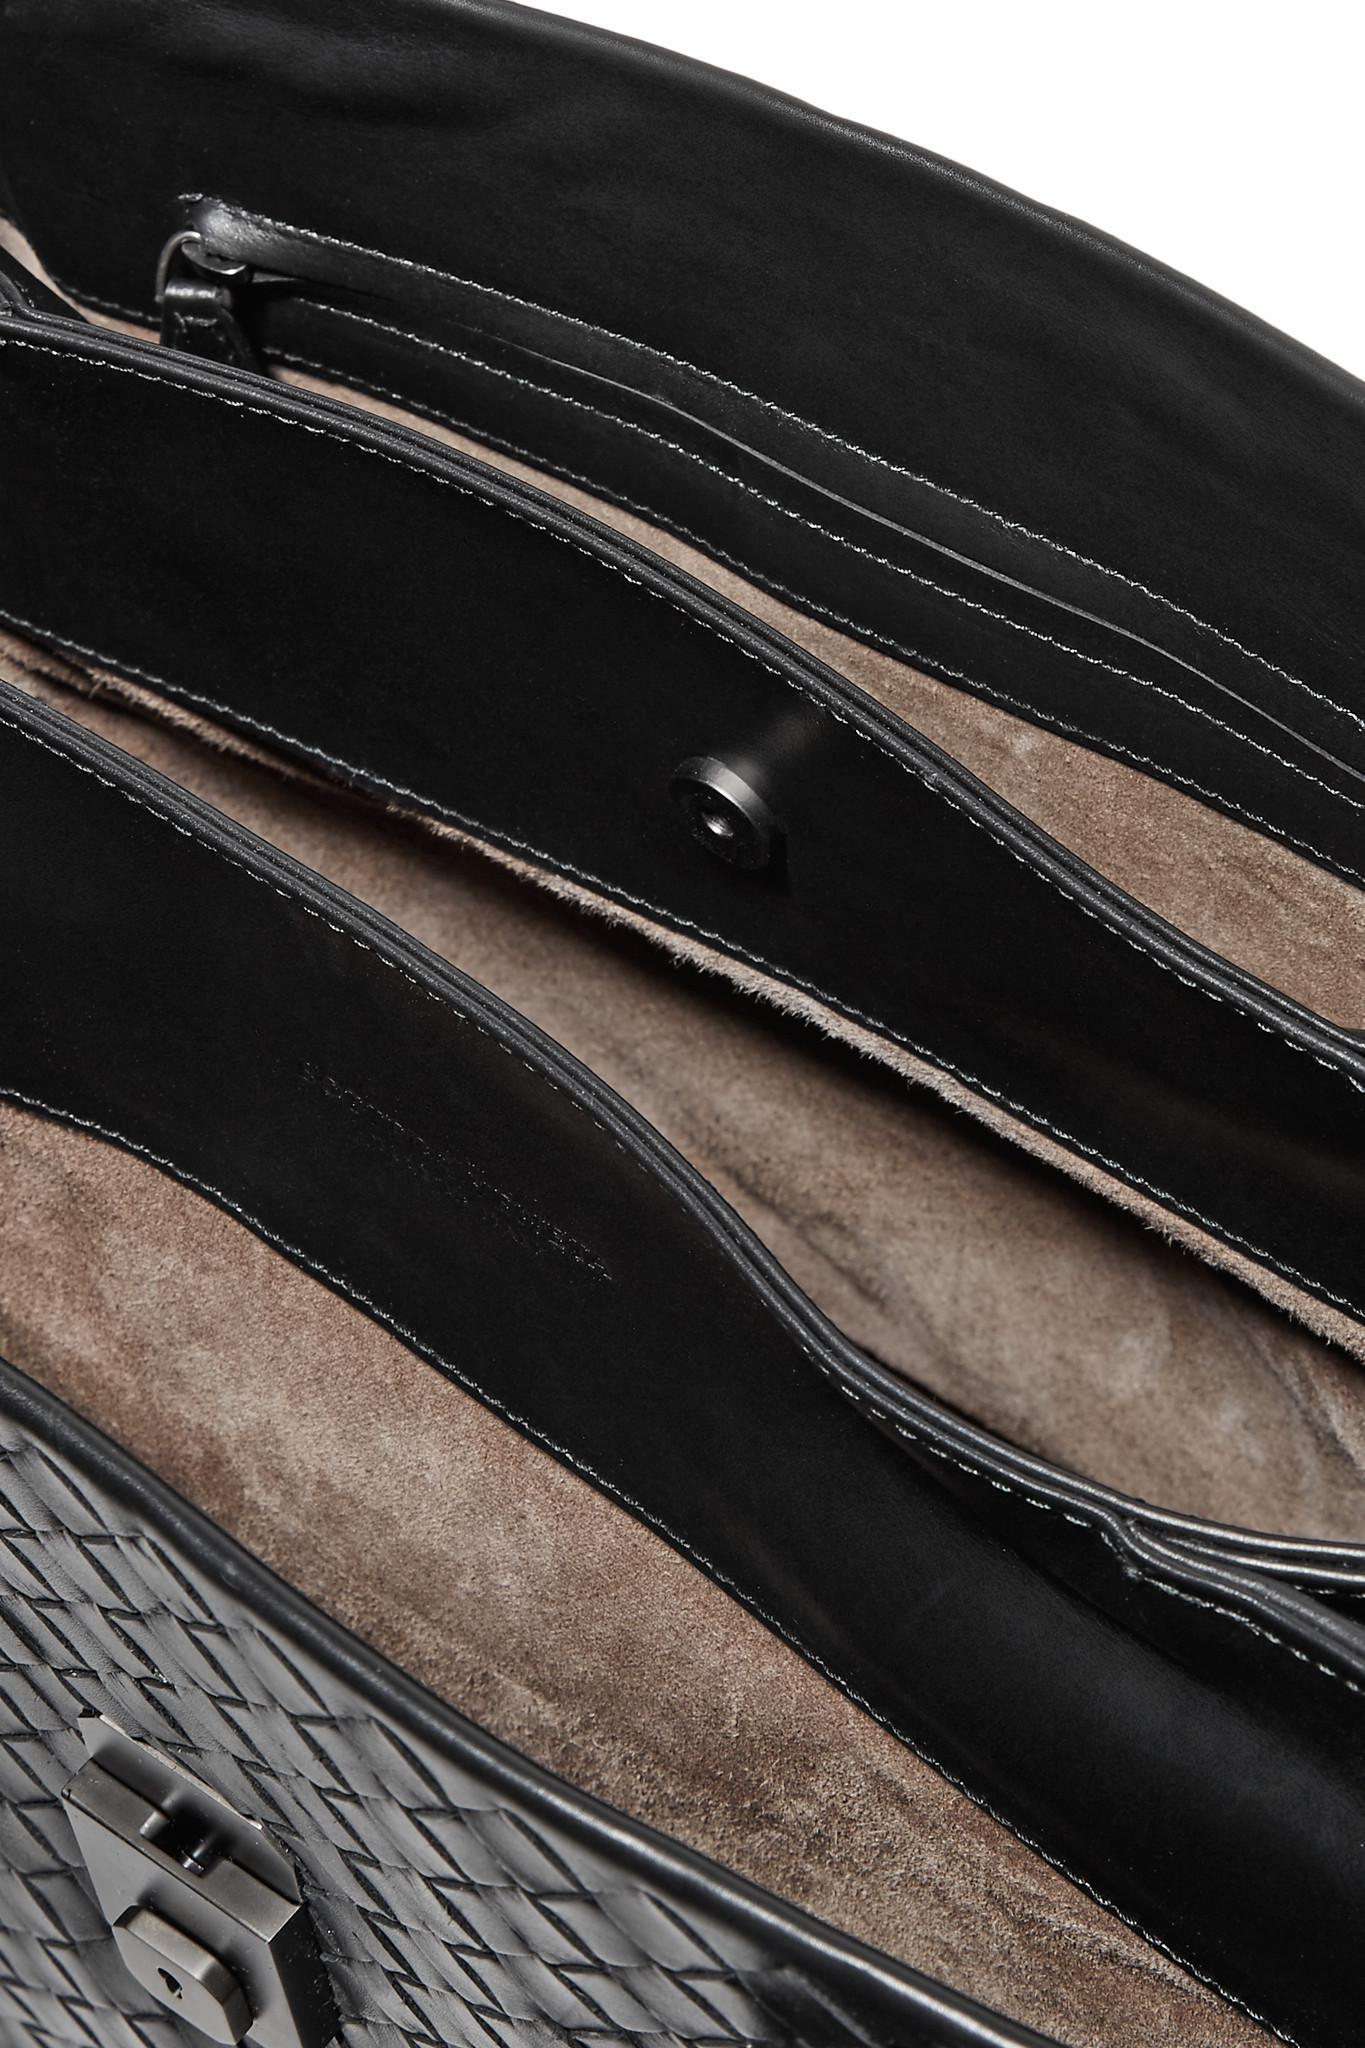 a5042c2278 Bottega Veneta - Black Roma Large Intrecciato Leather Tote - Lyst. View  fullscreen